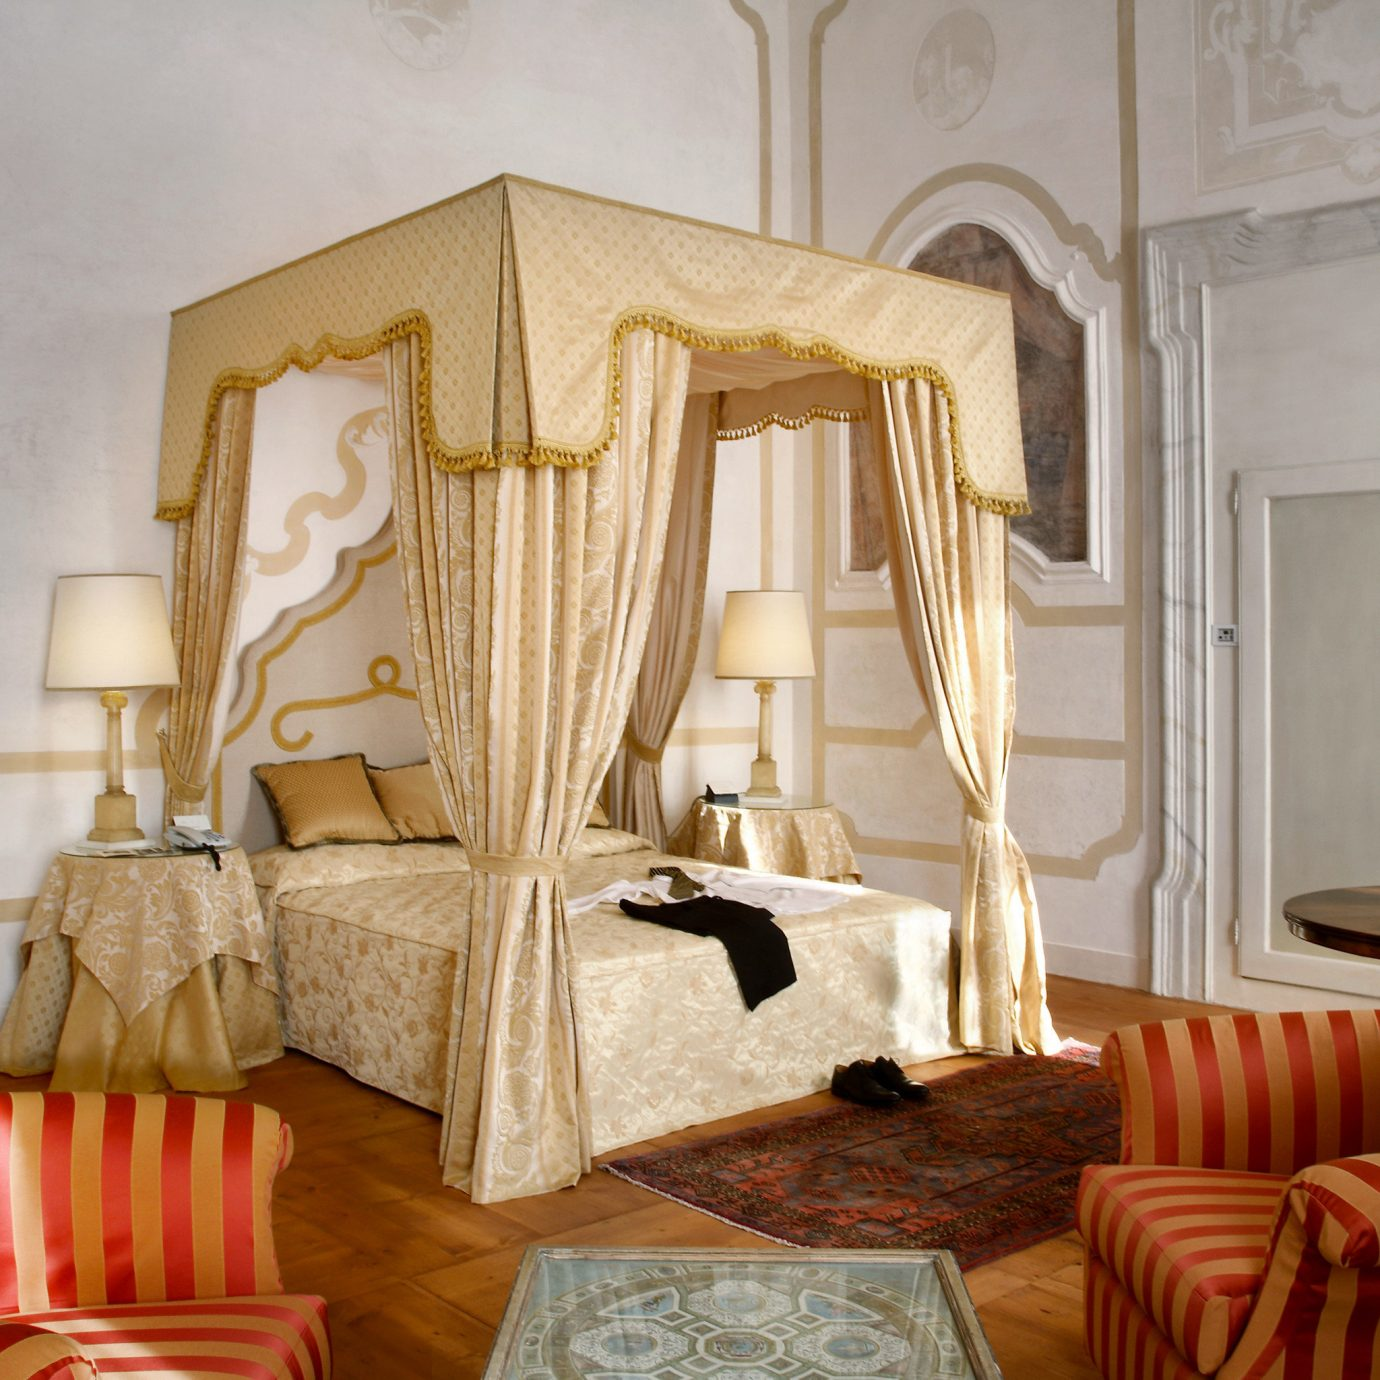 Bedroom Elegant Historic property living room home curtain cottage Suite mansion